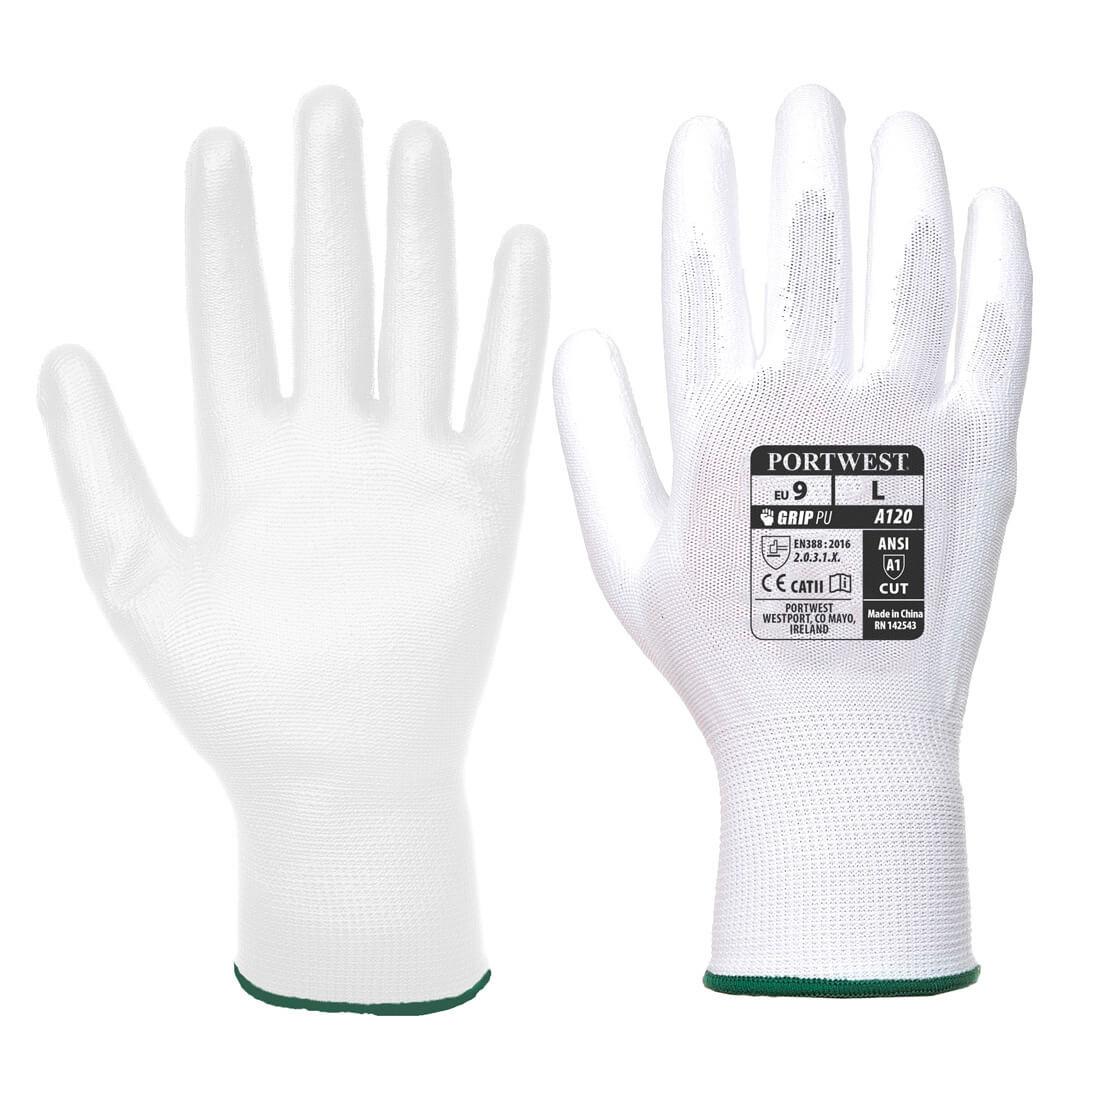 Manusa PU Palm - Echipamente de protectie personala